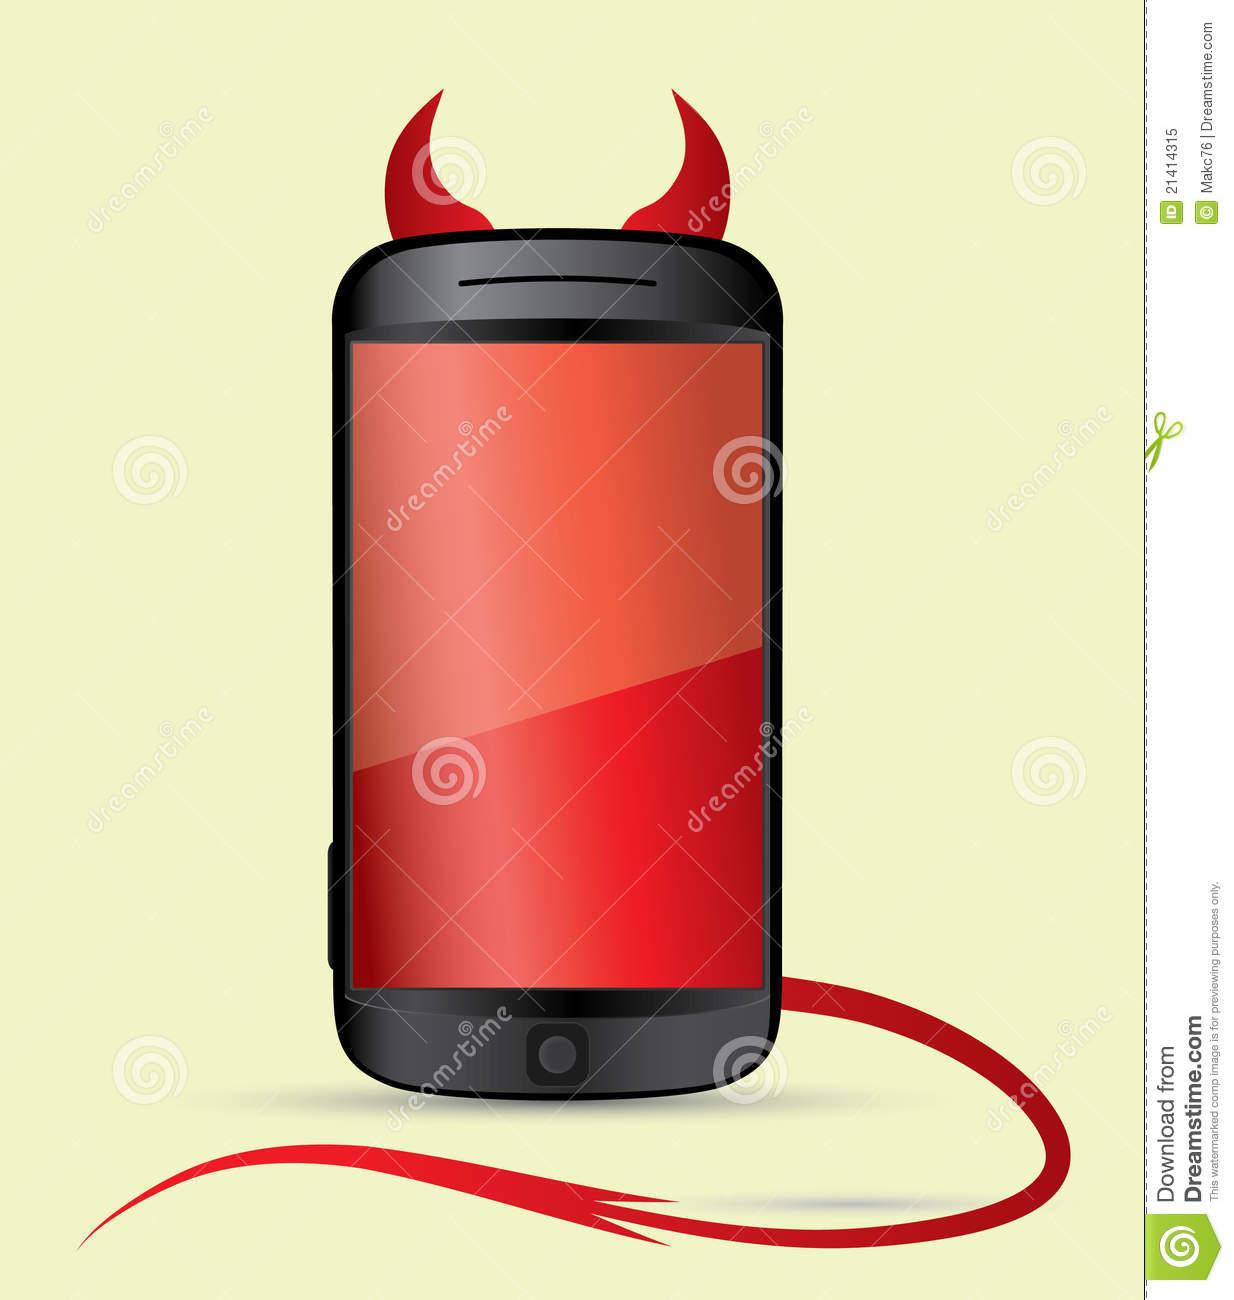 smartphone-devil-21414315.jpg